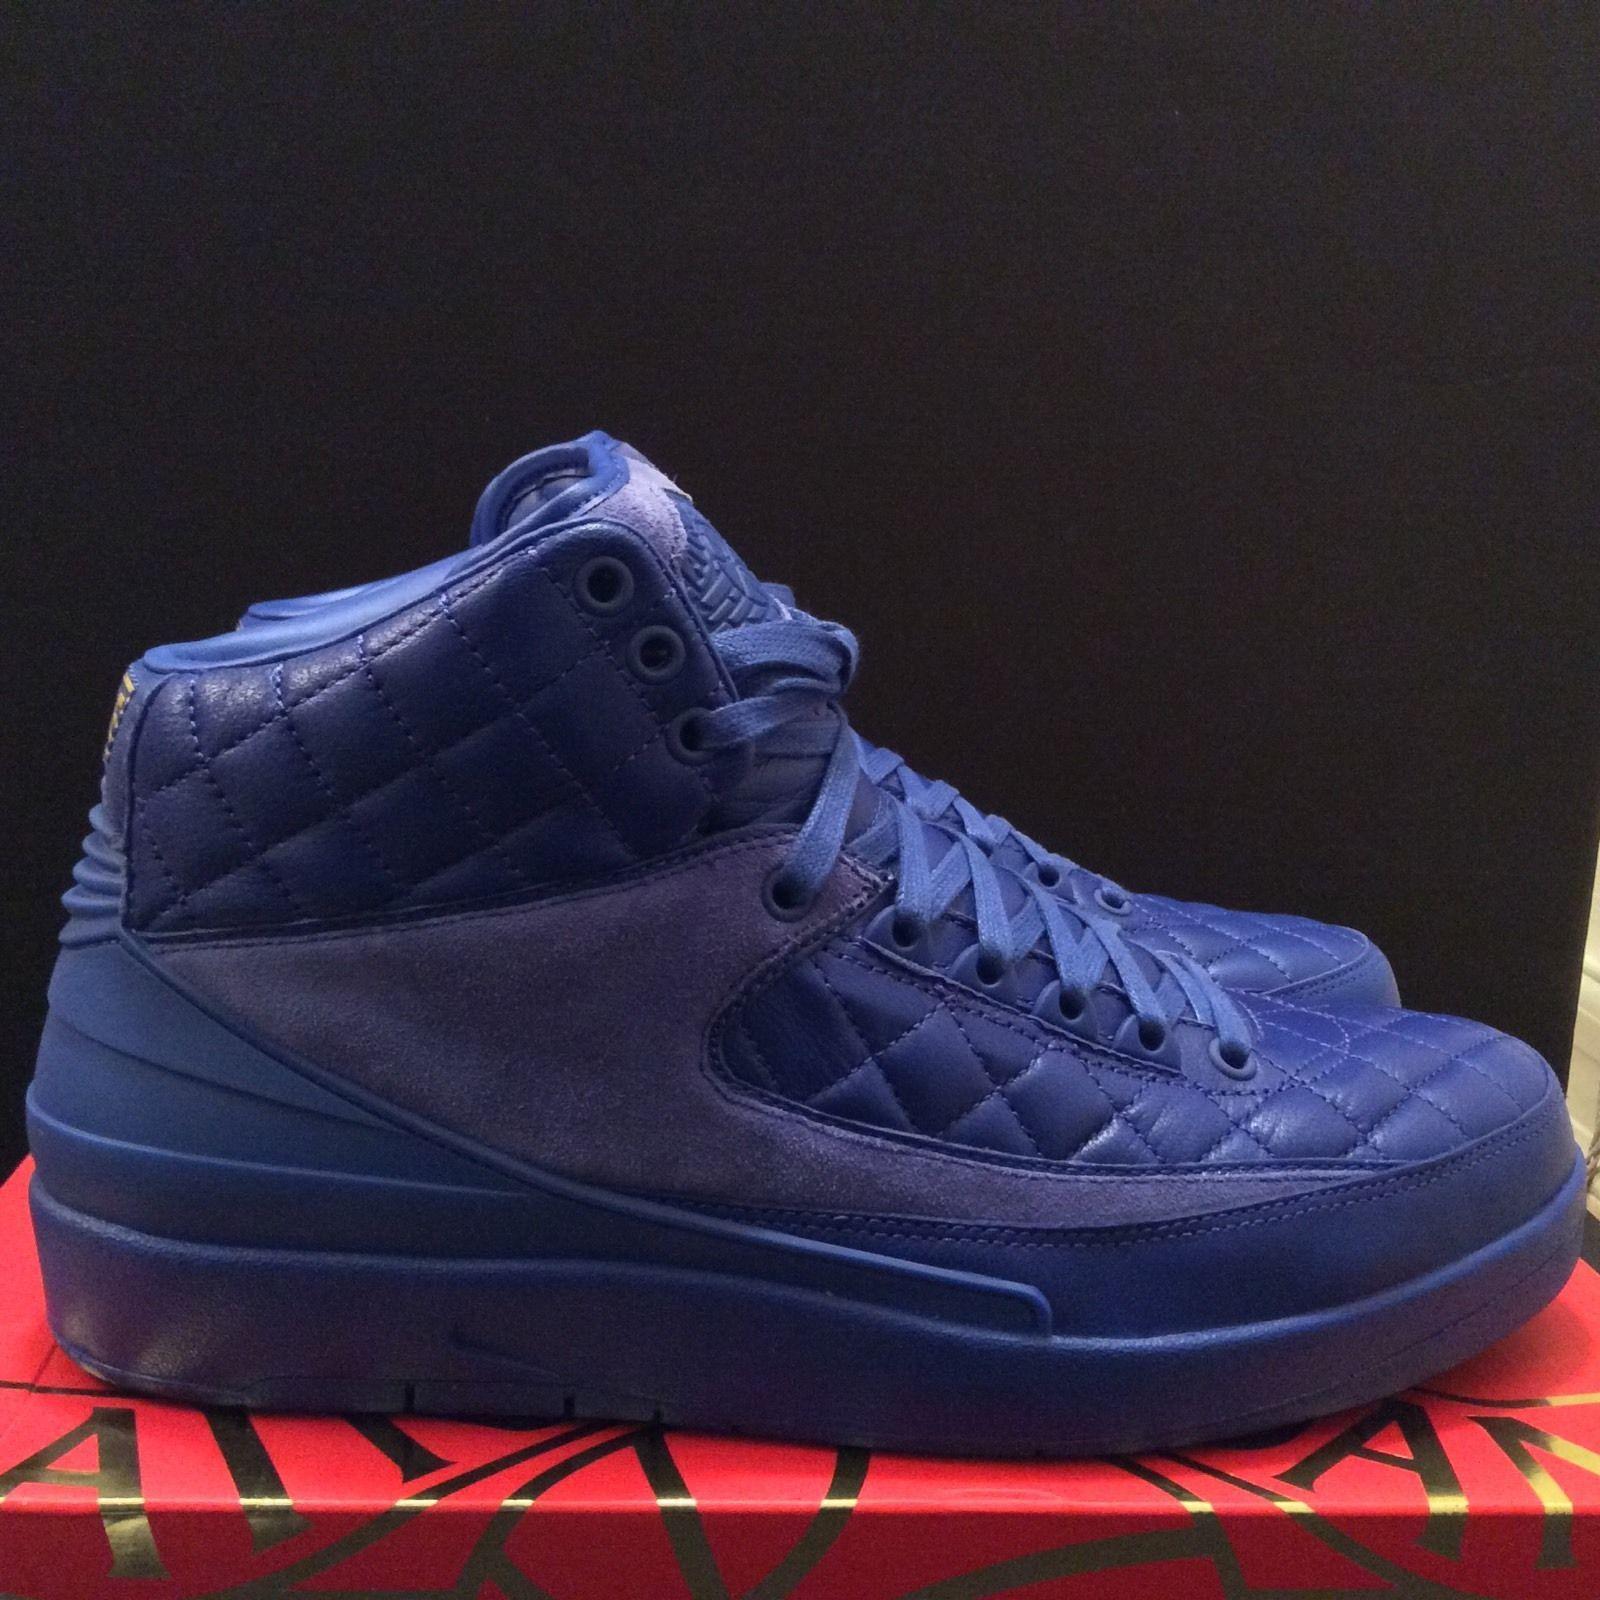 146763e985888d Details about Nike Air Jordan Legacy 312 NRG SZ 10.5 Just Don C ...